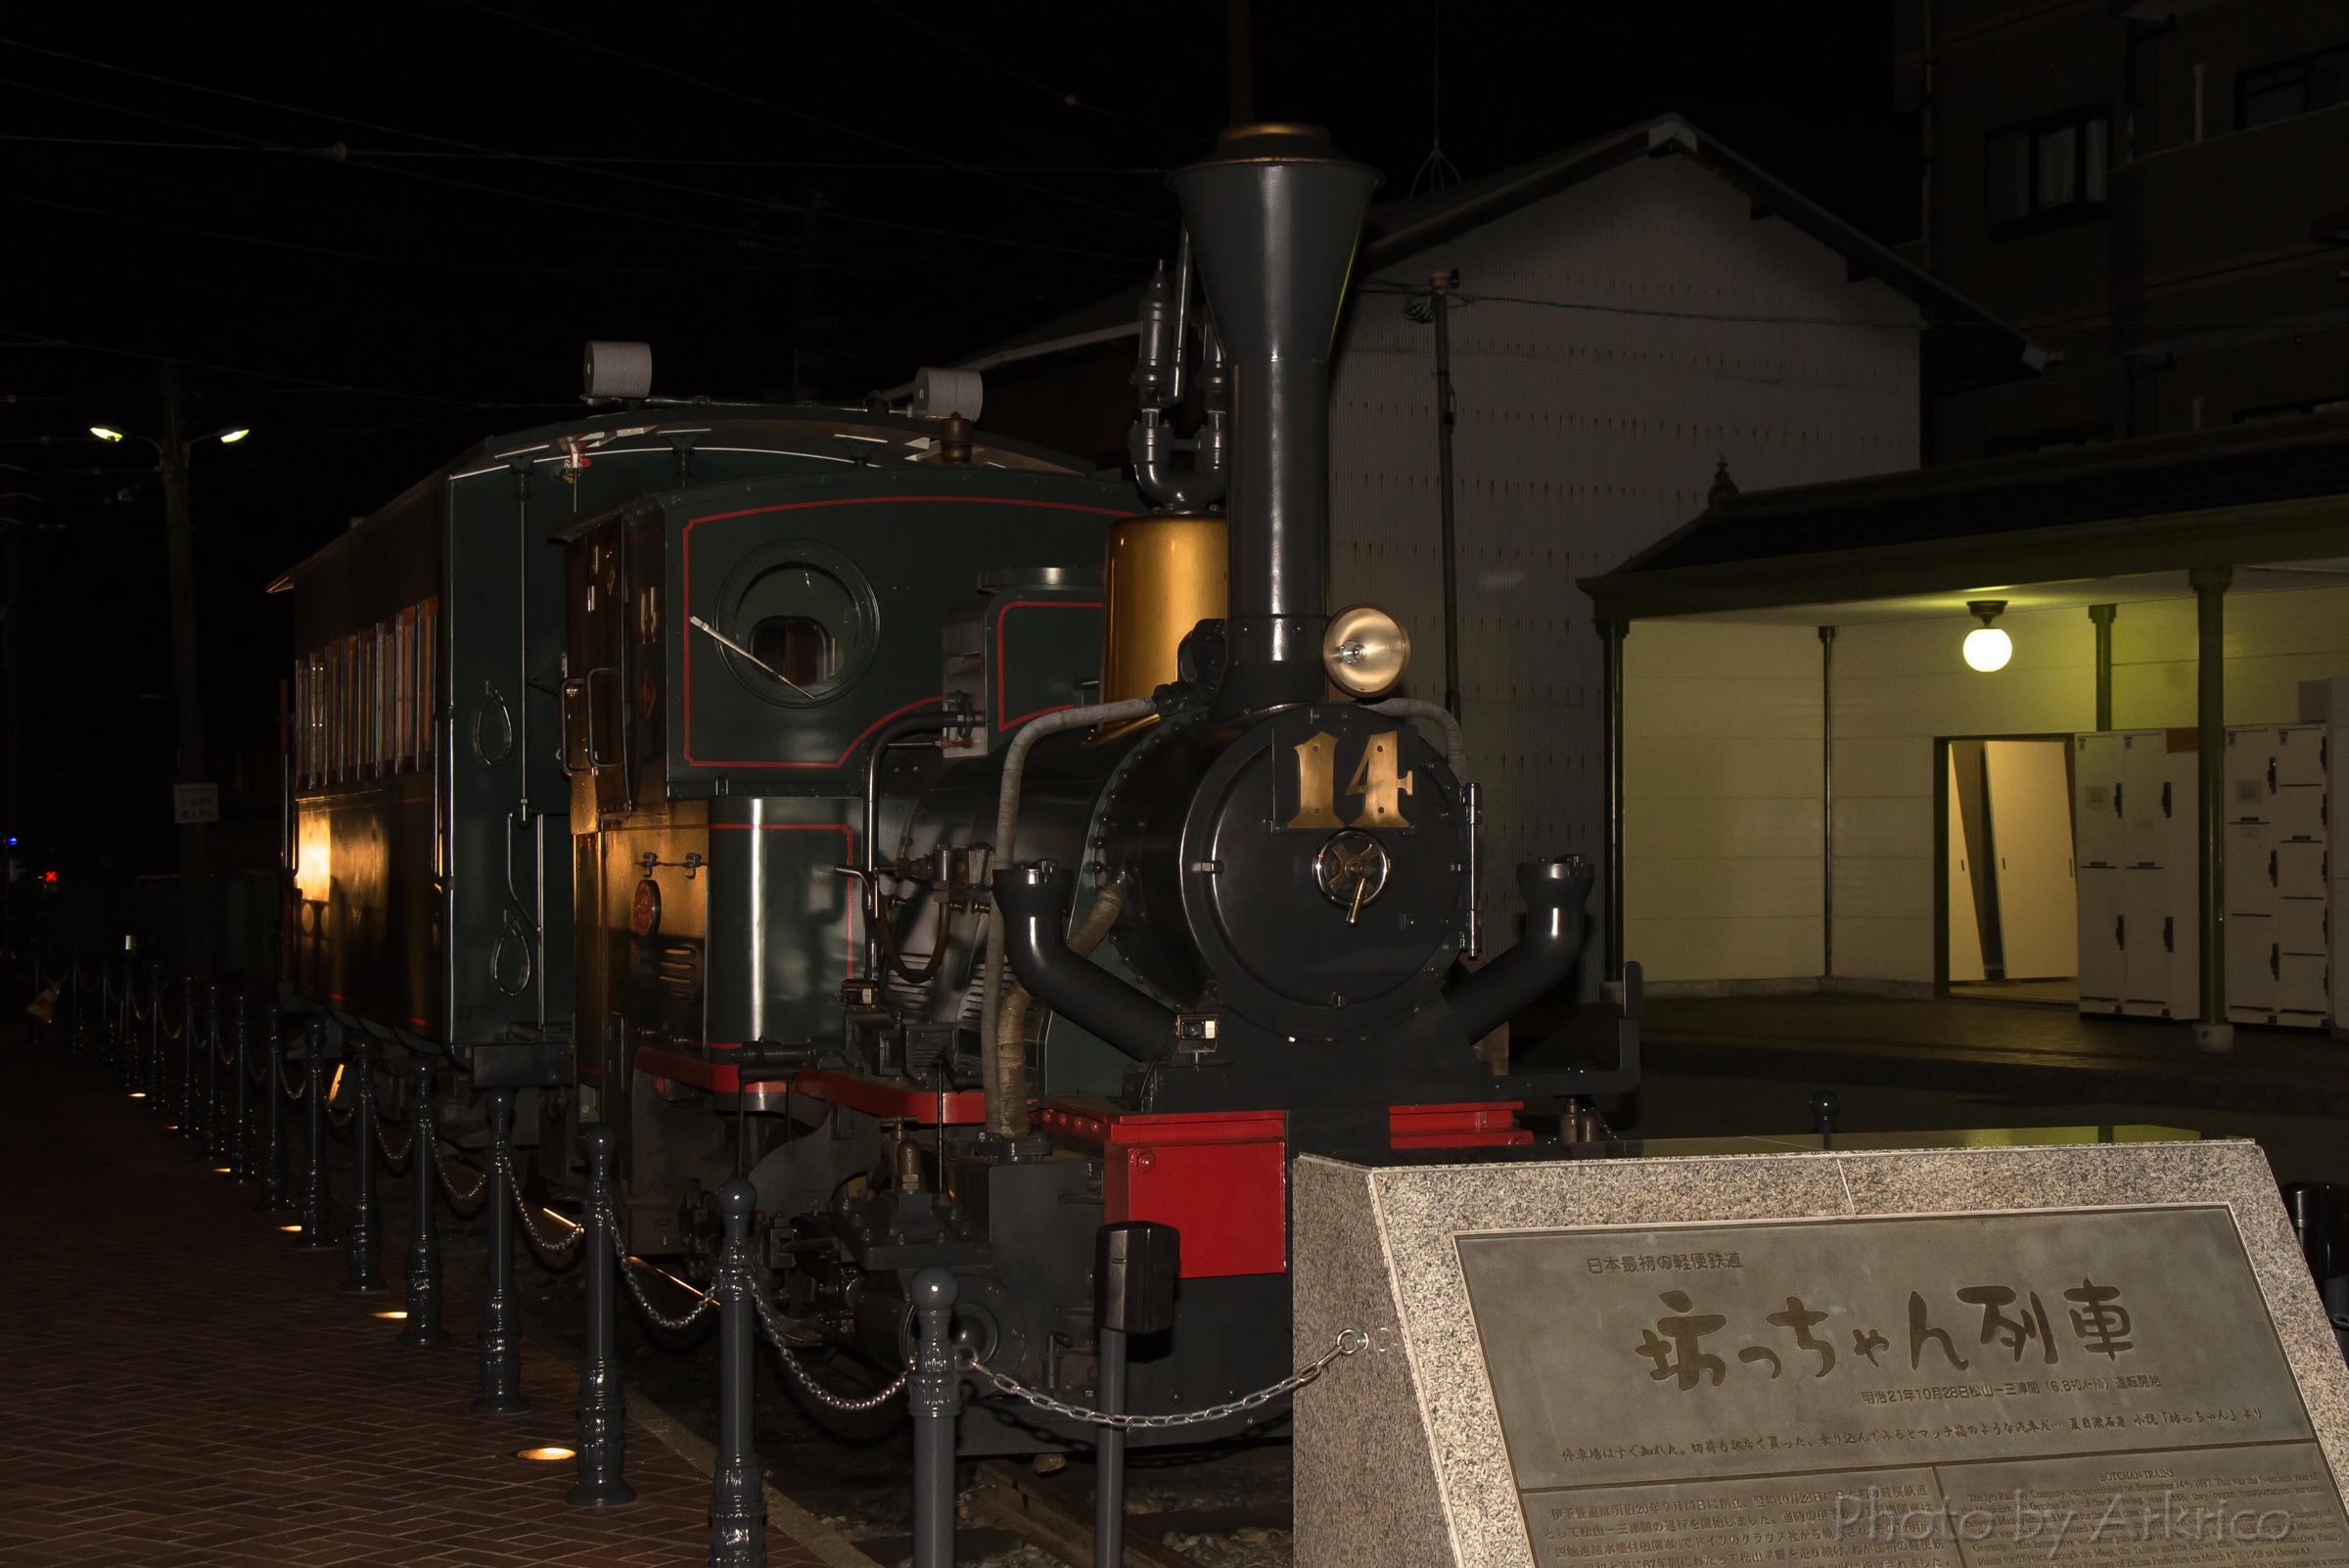 An old locomotive.